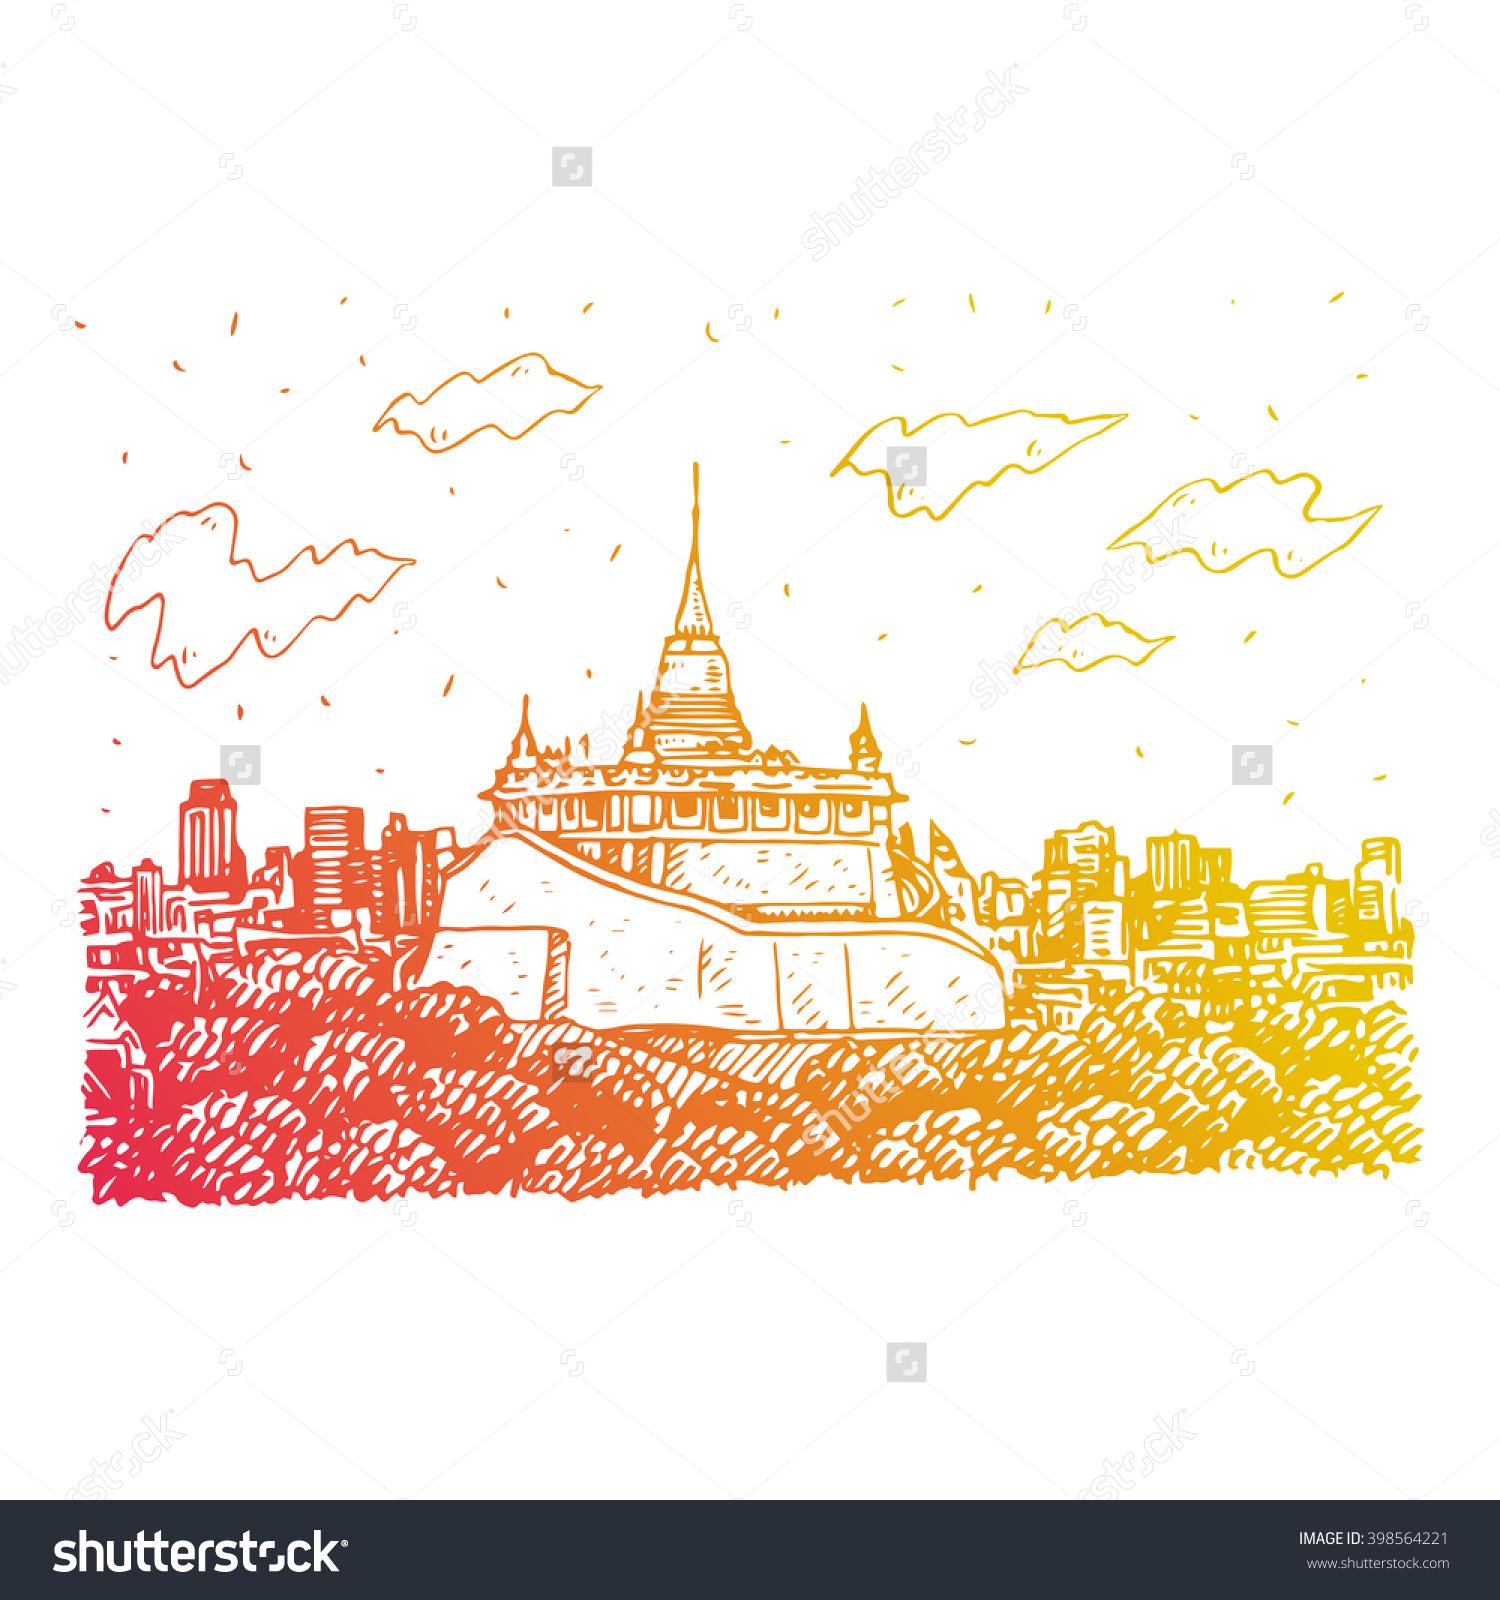 The Golden Mount At Wat Saket In Bangkok, Thailand. Sketch By Hand.